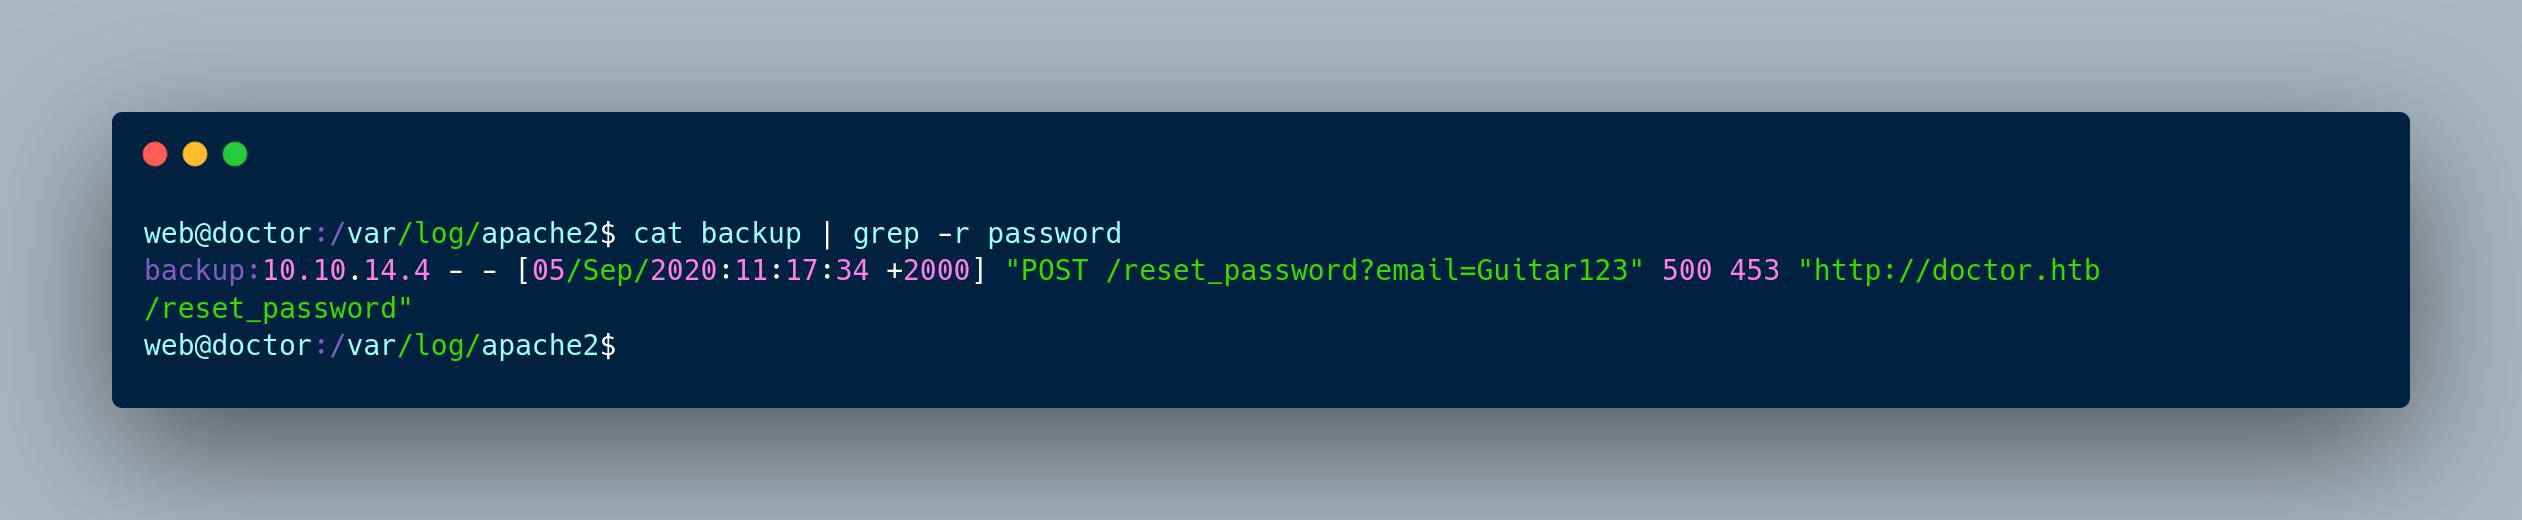 password_found